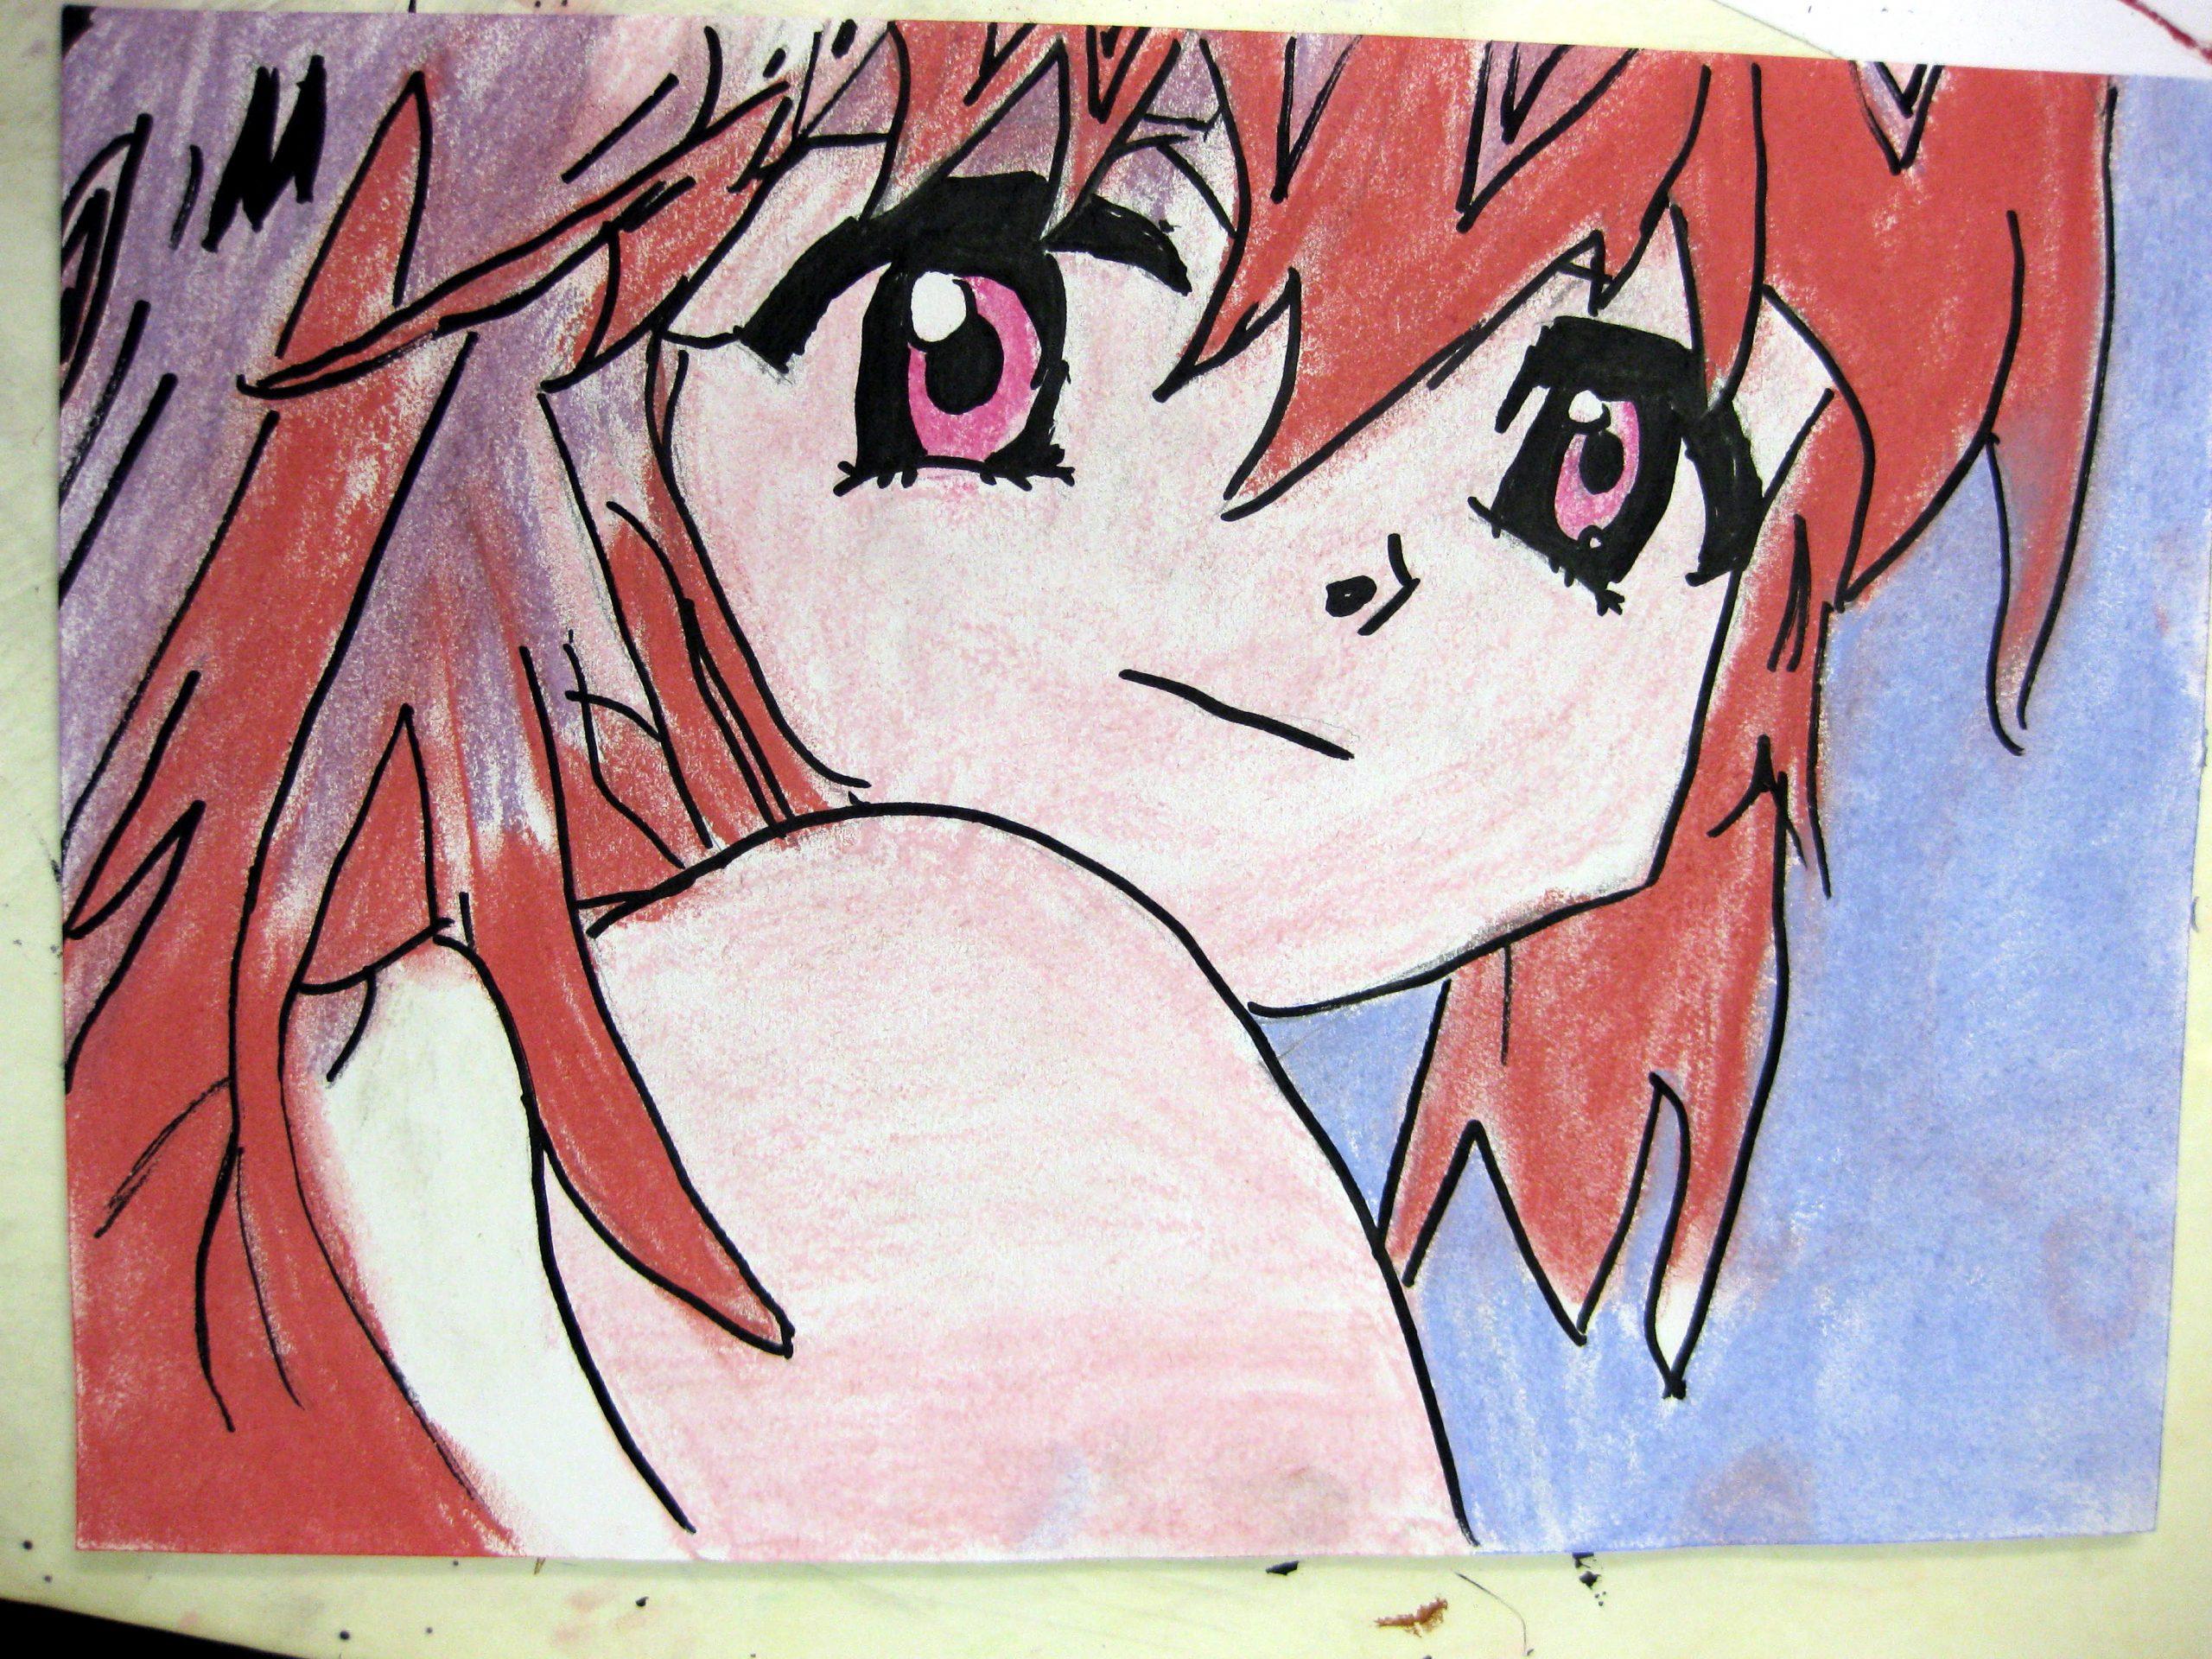 Manga mit rotem Haar